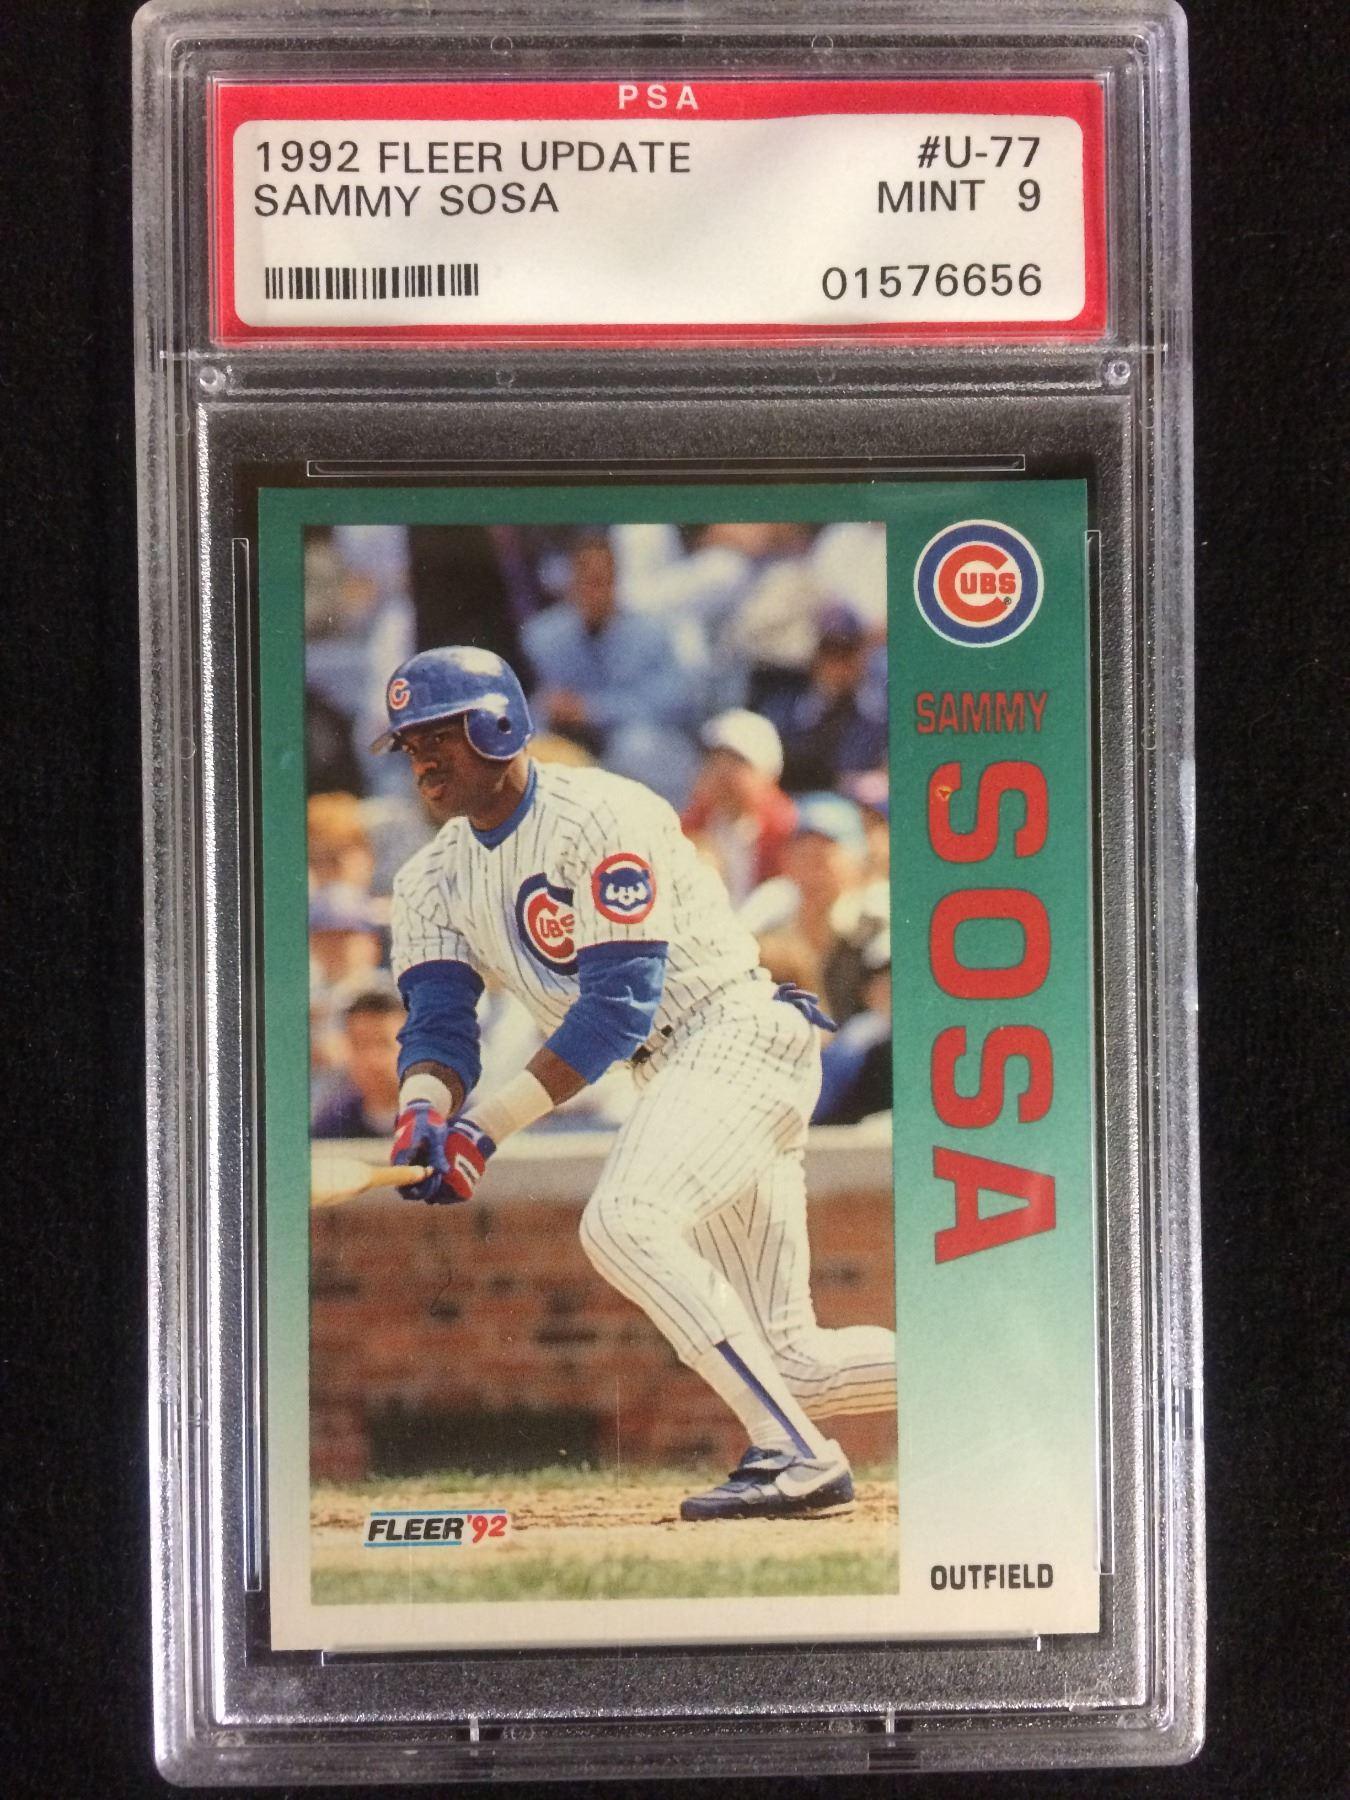 1992 Fleer Update U 77 Sammy Sosa Baseball Card Lot Mint 9 Psa Graded